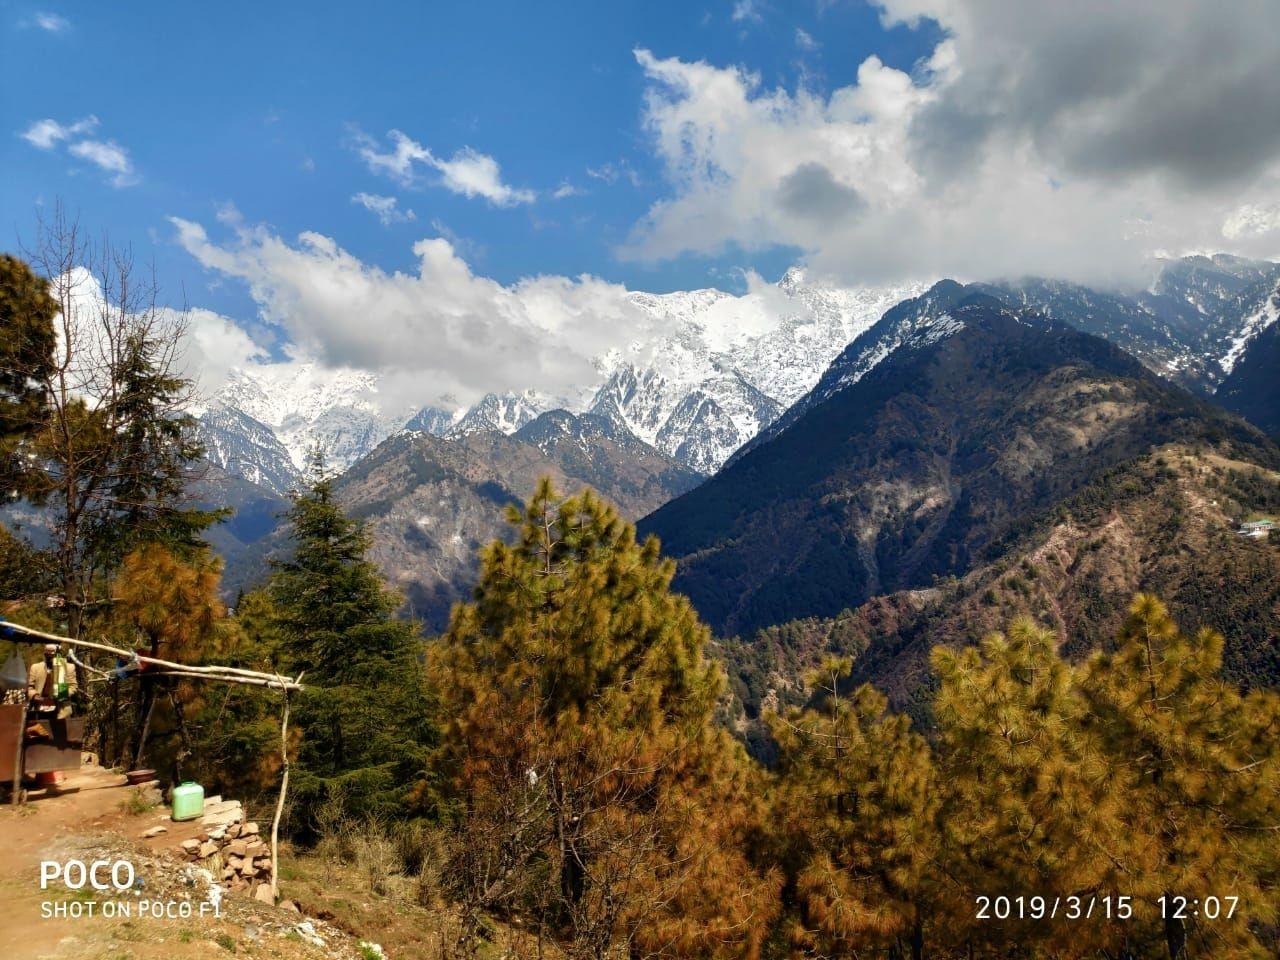 Photo of Naddi By Rane travels